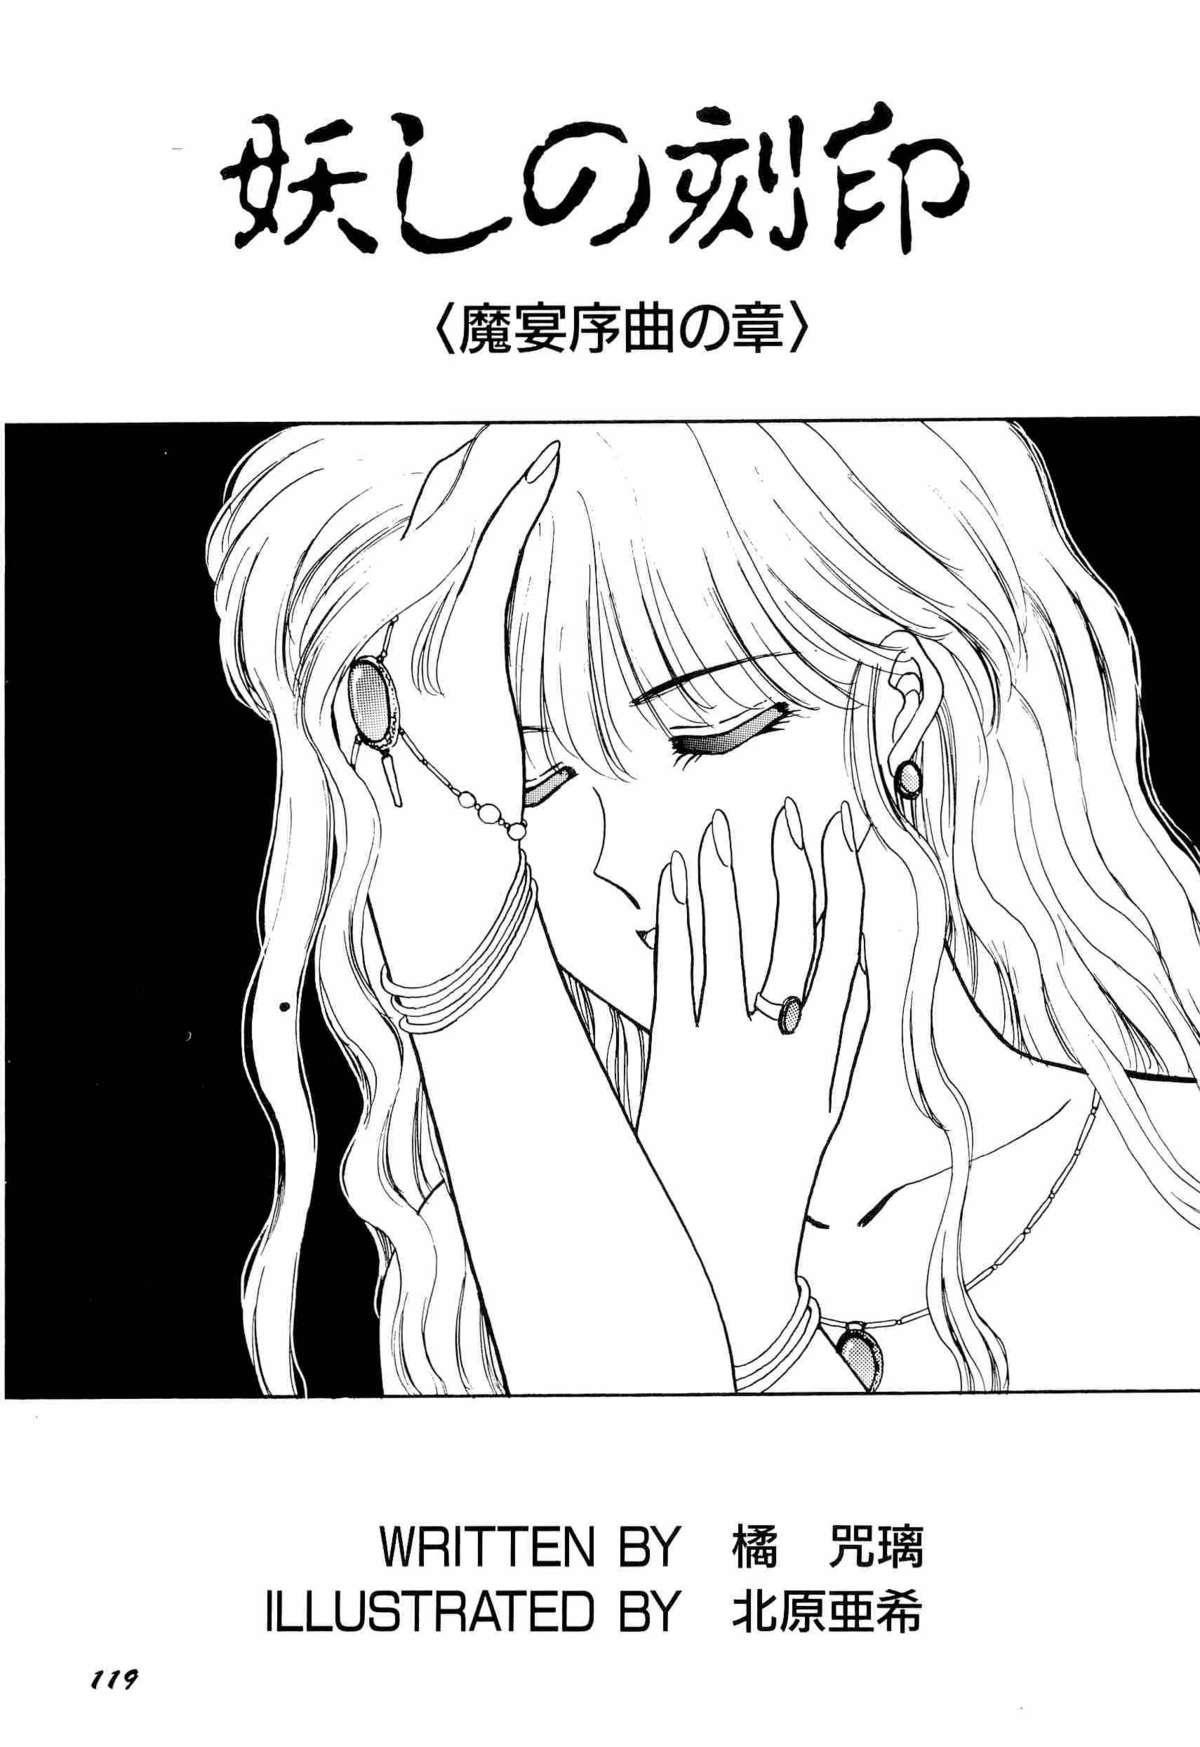 Bisyoujo Anthology '93 jyoukan 121